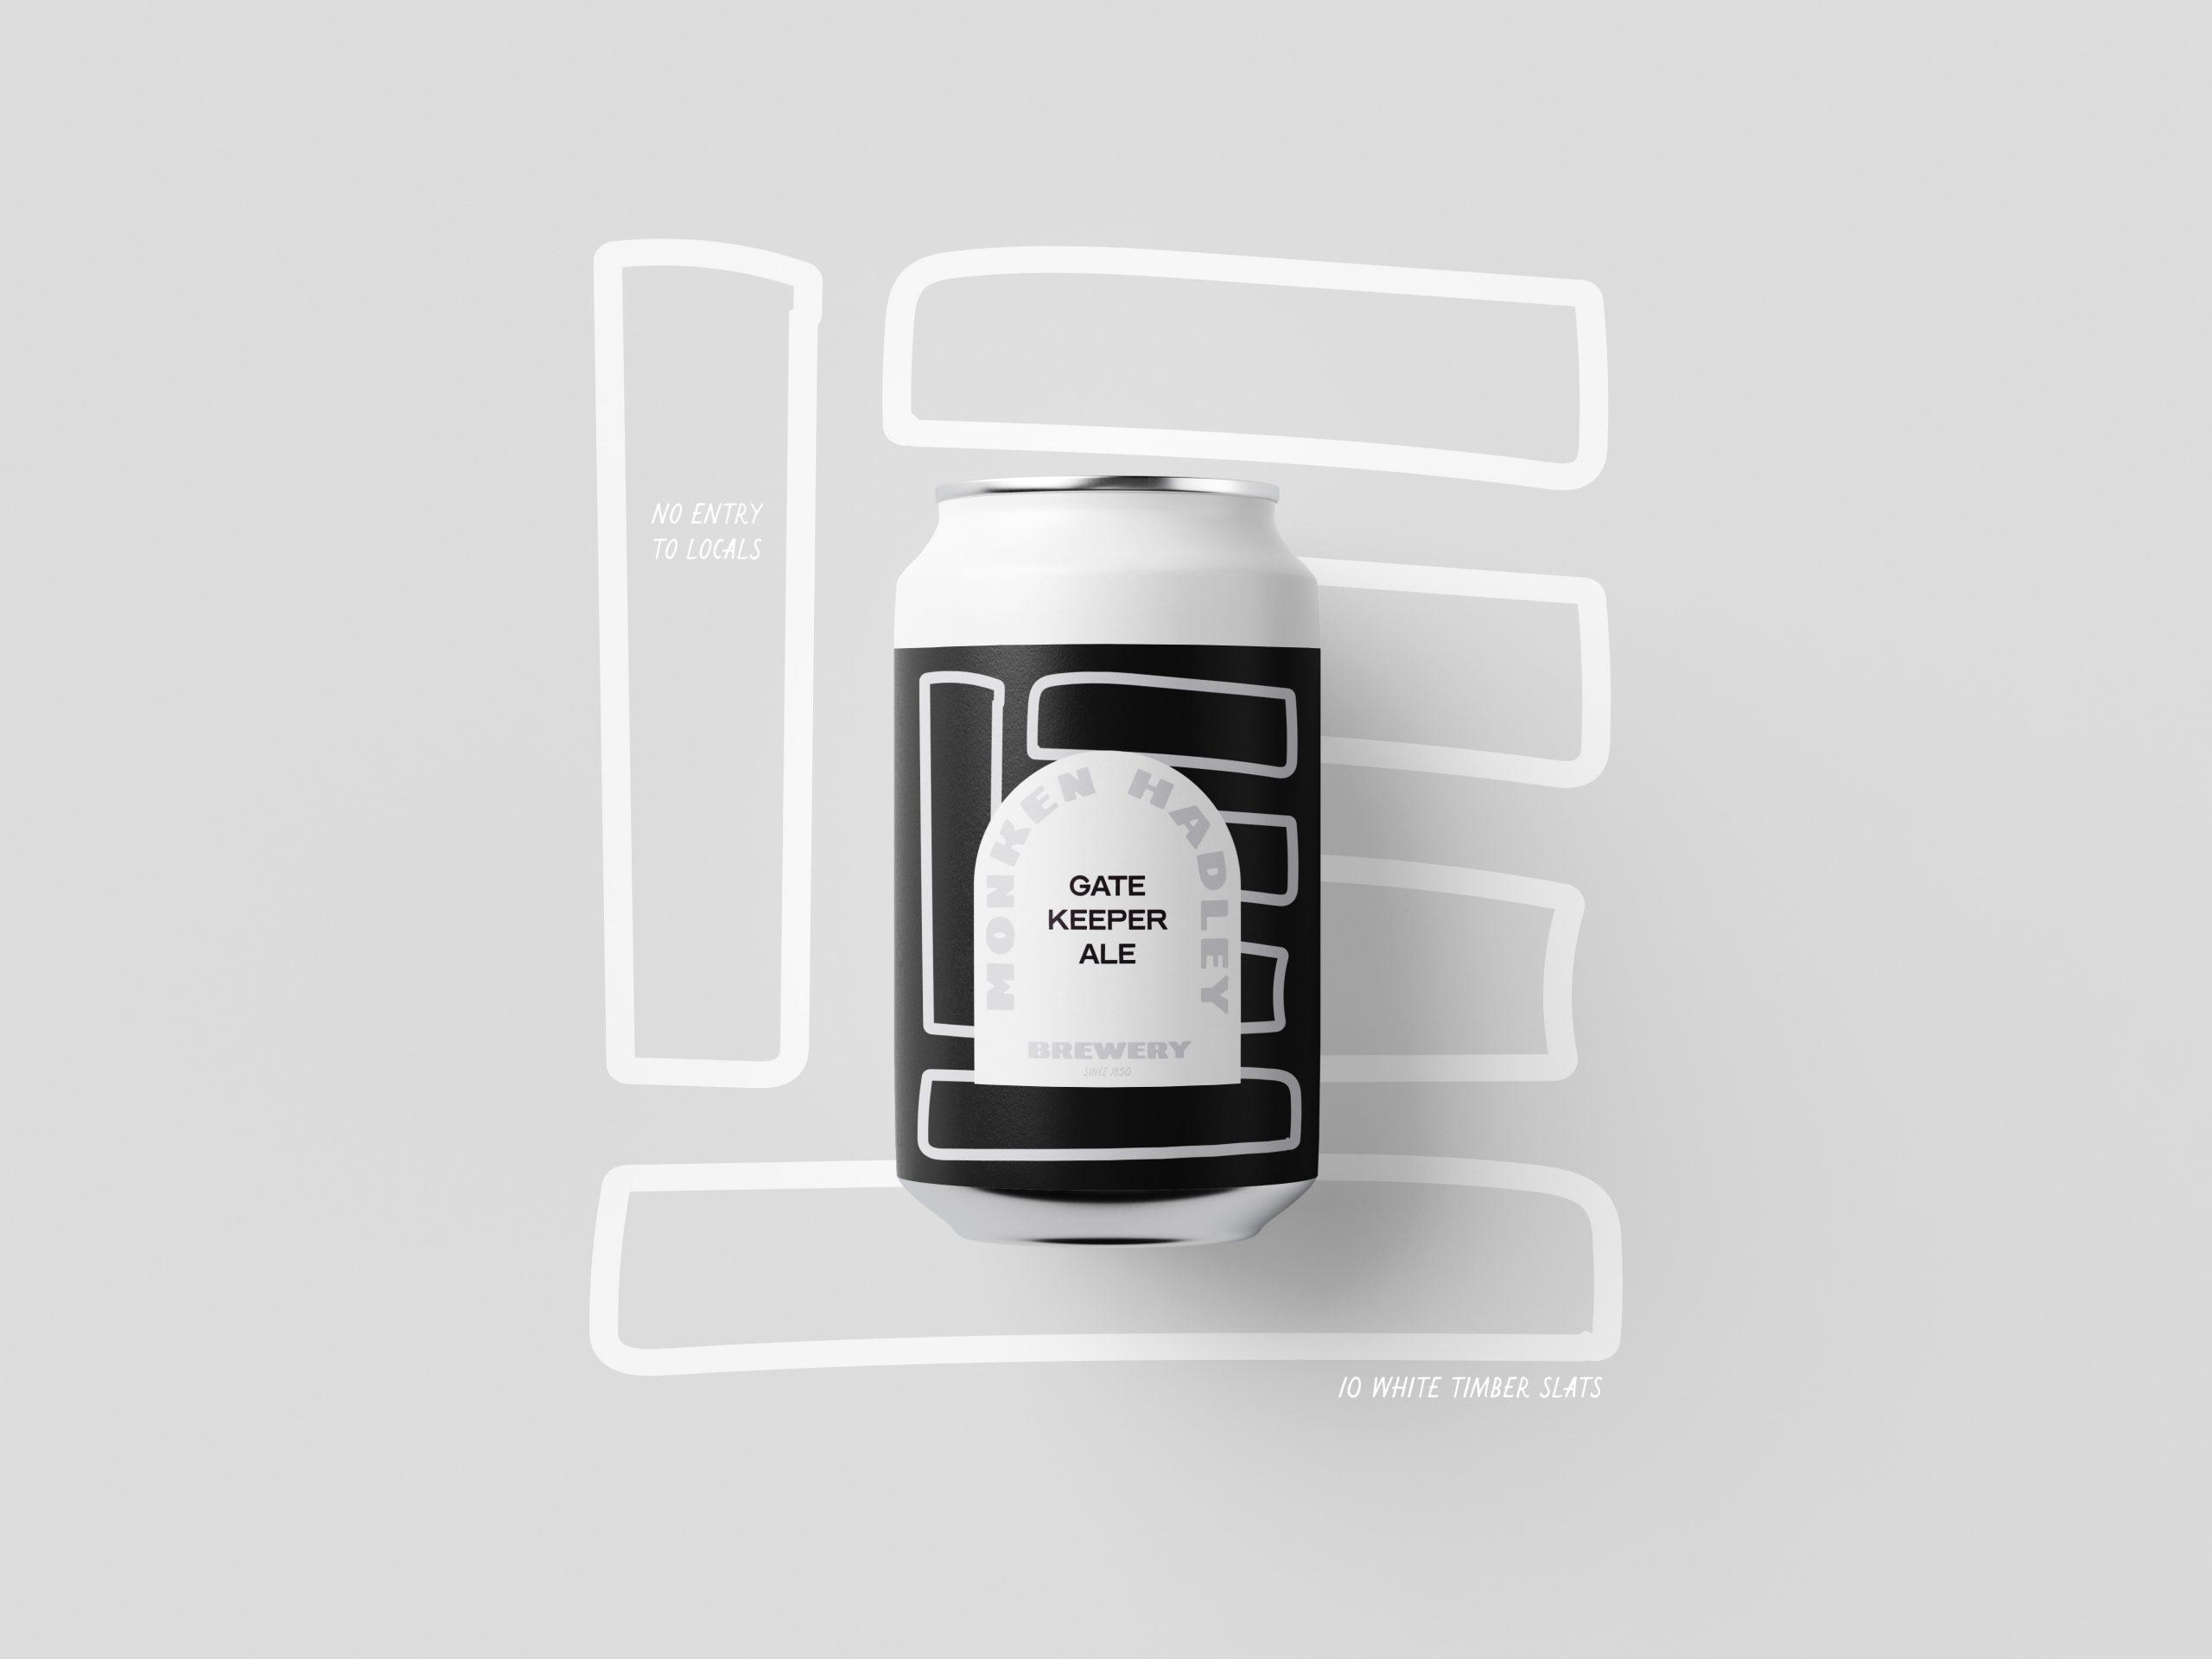 Monken-Hadley-Brewery_SingleCan-Mock_GateKeeperAle_03